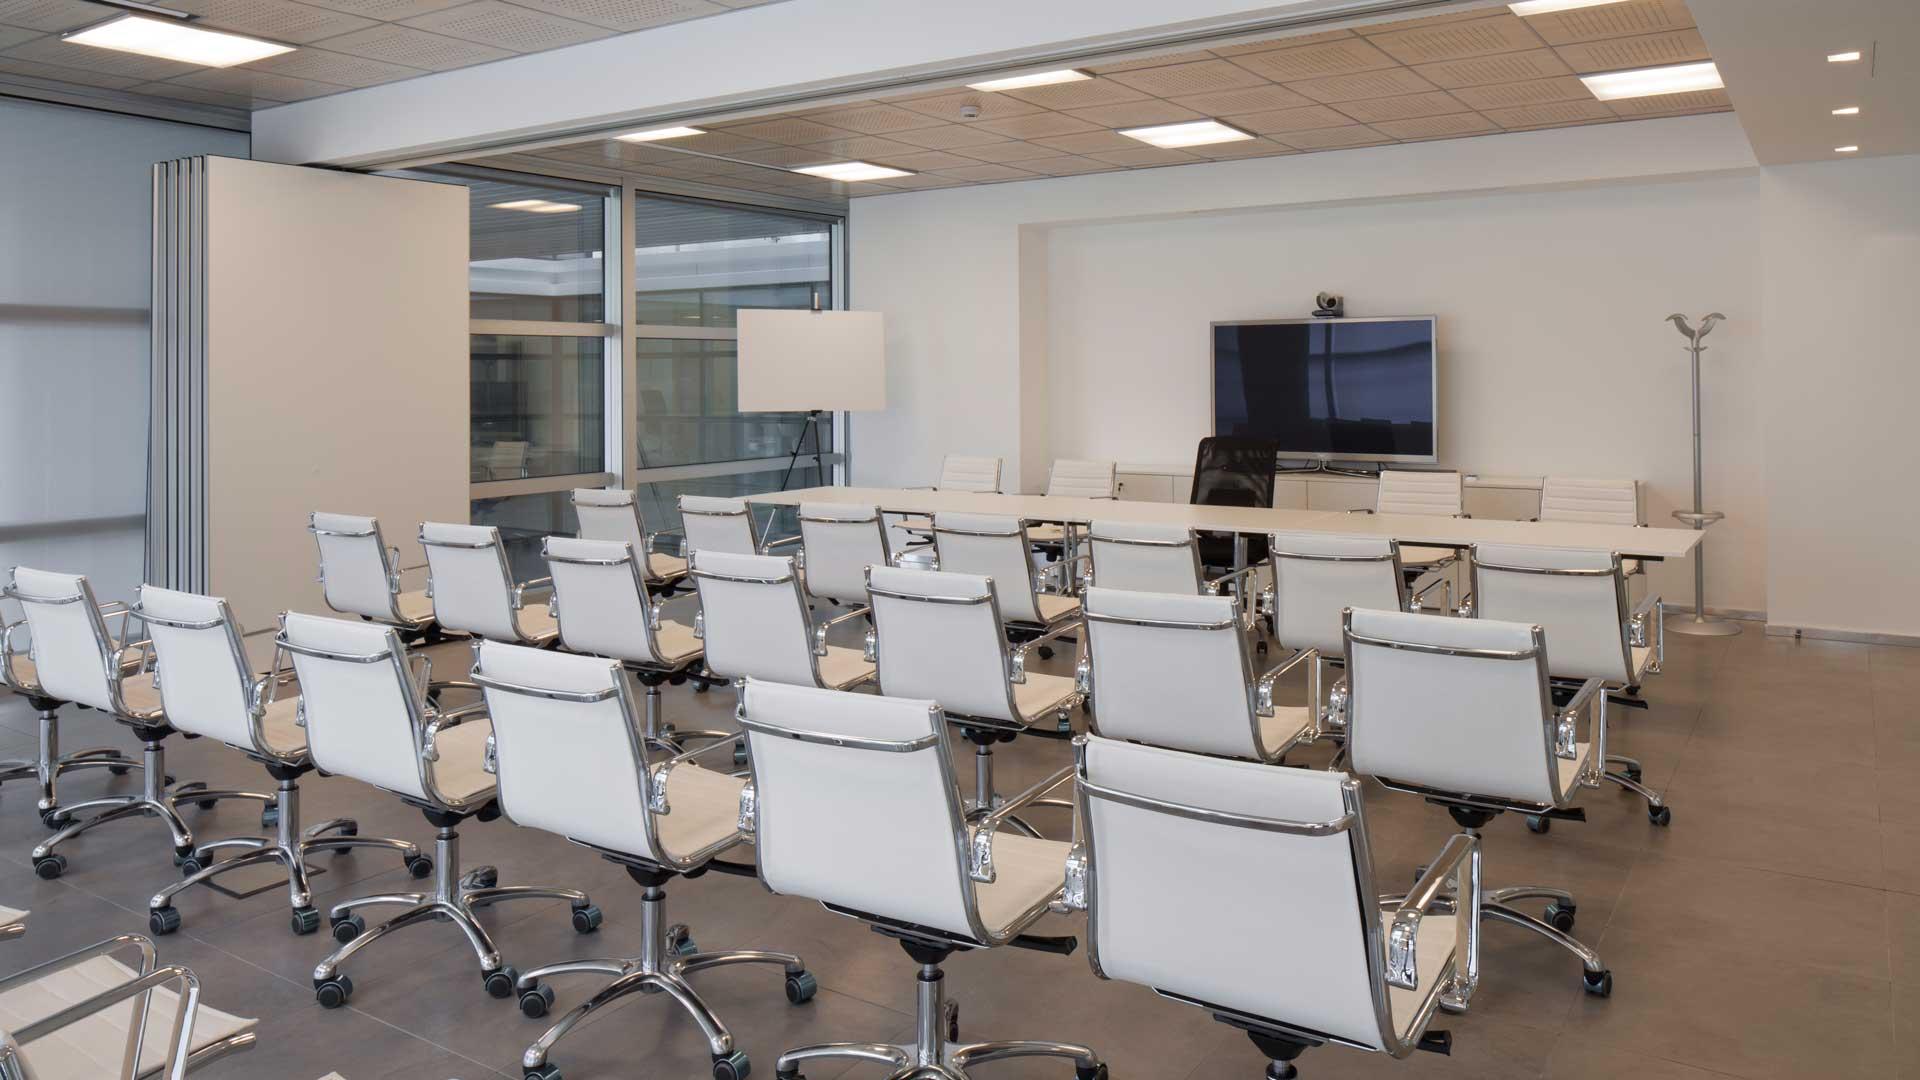 Leo-pharma-training-room-level-office-landscape